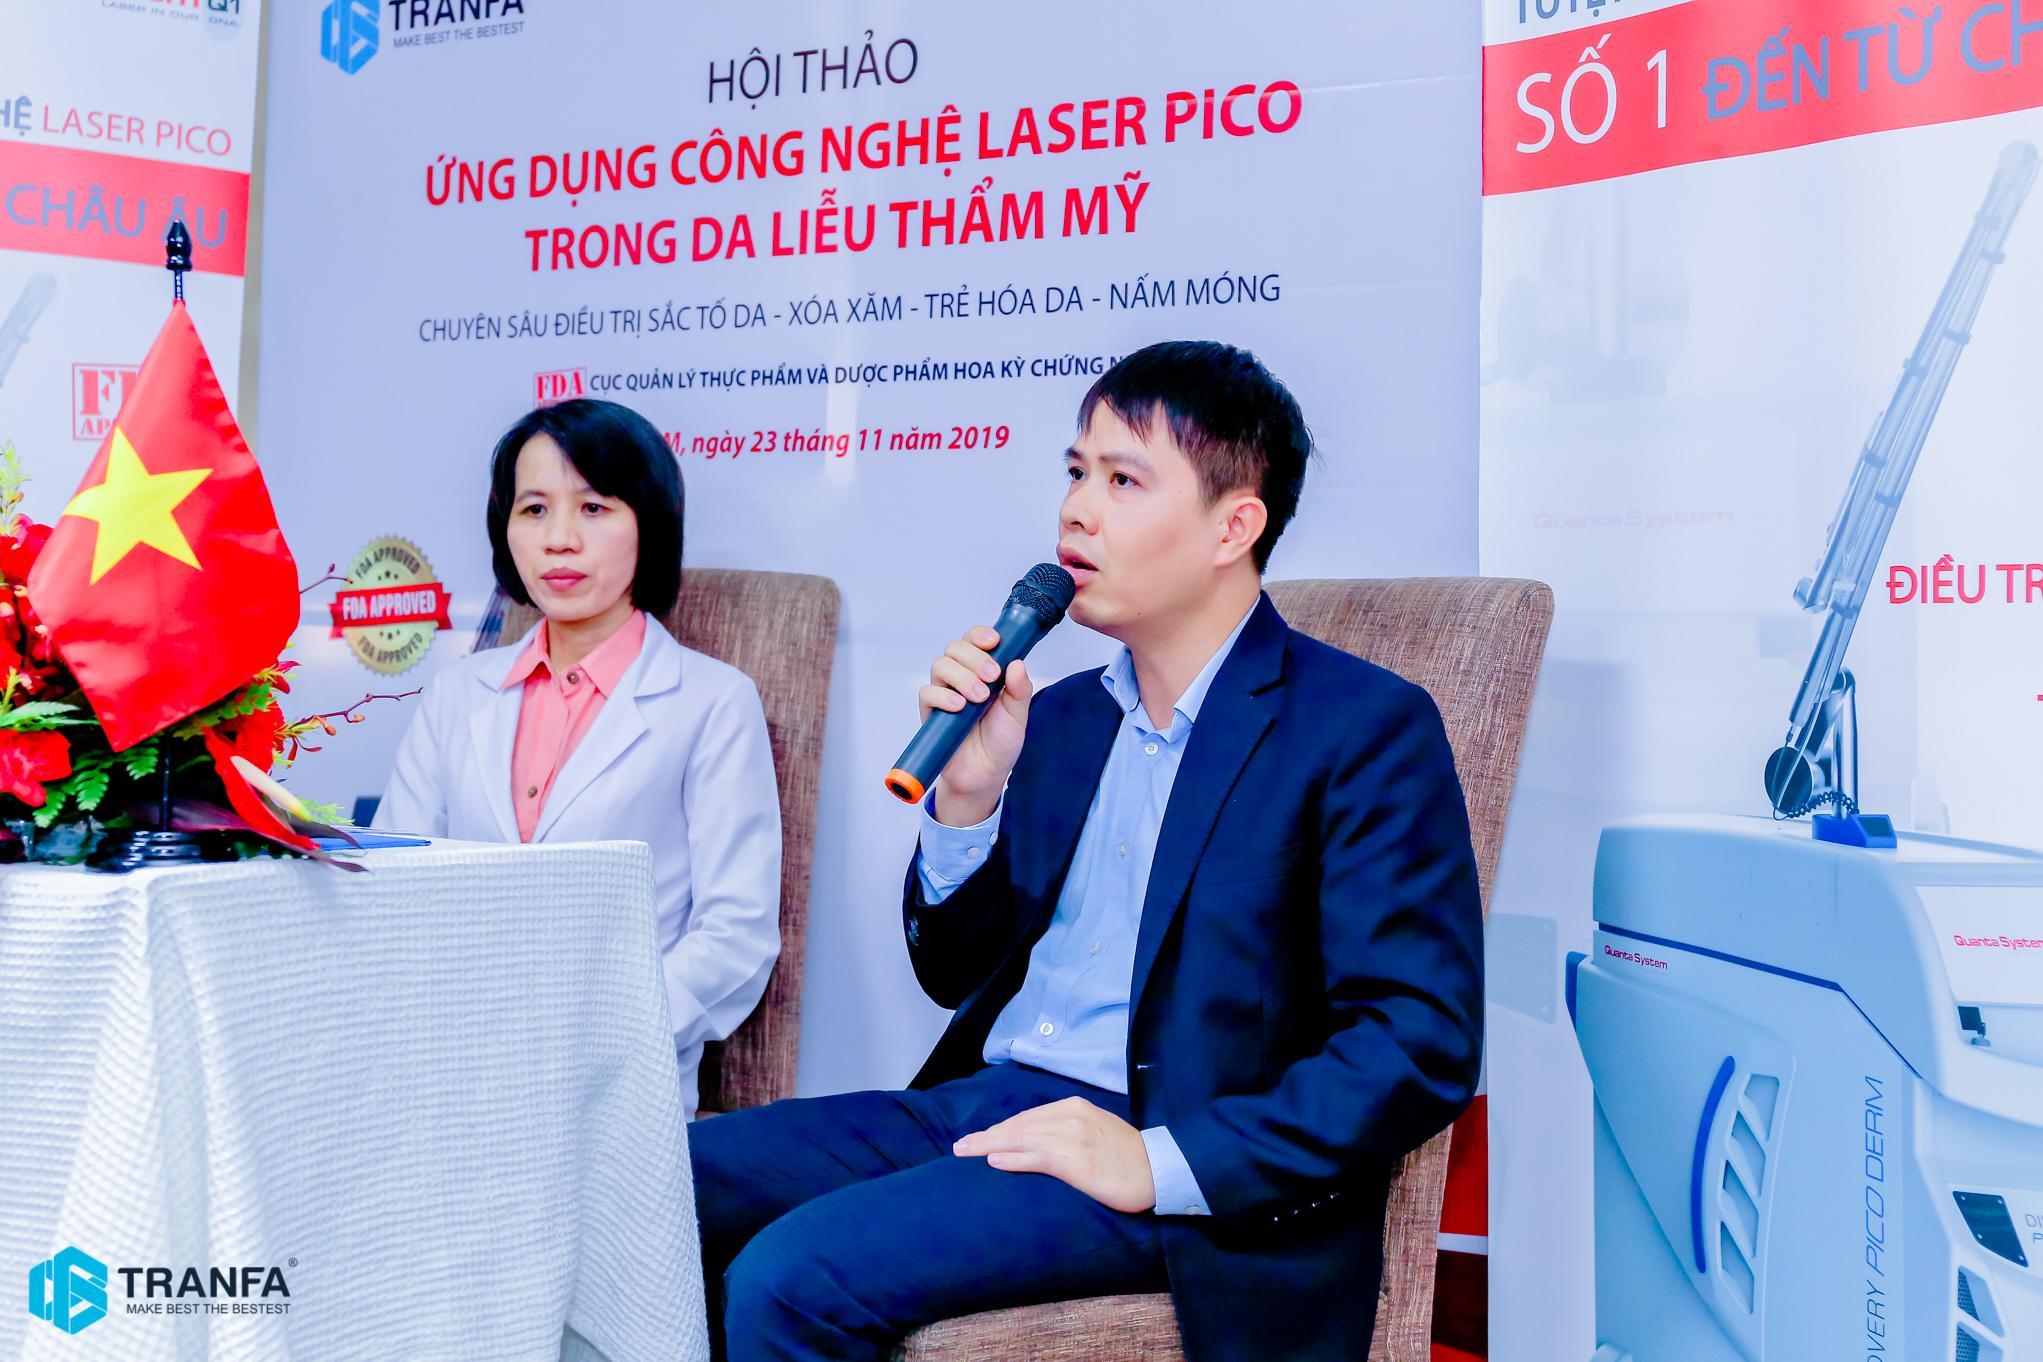 hoi-thao-laser-pico